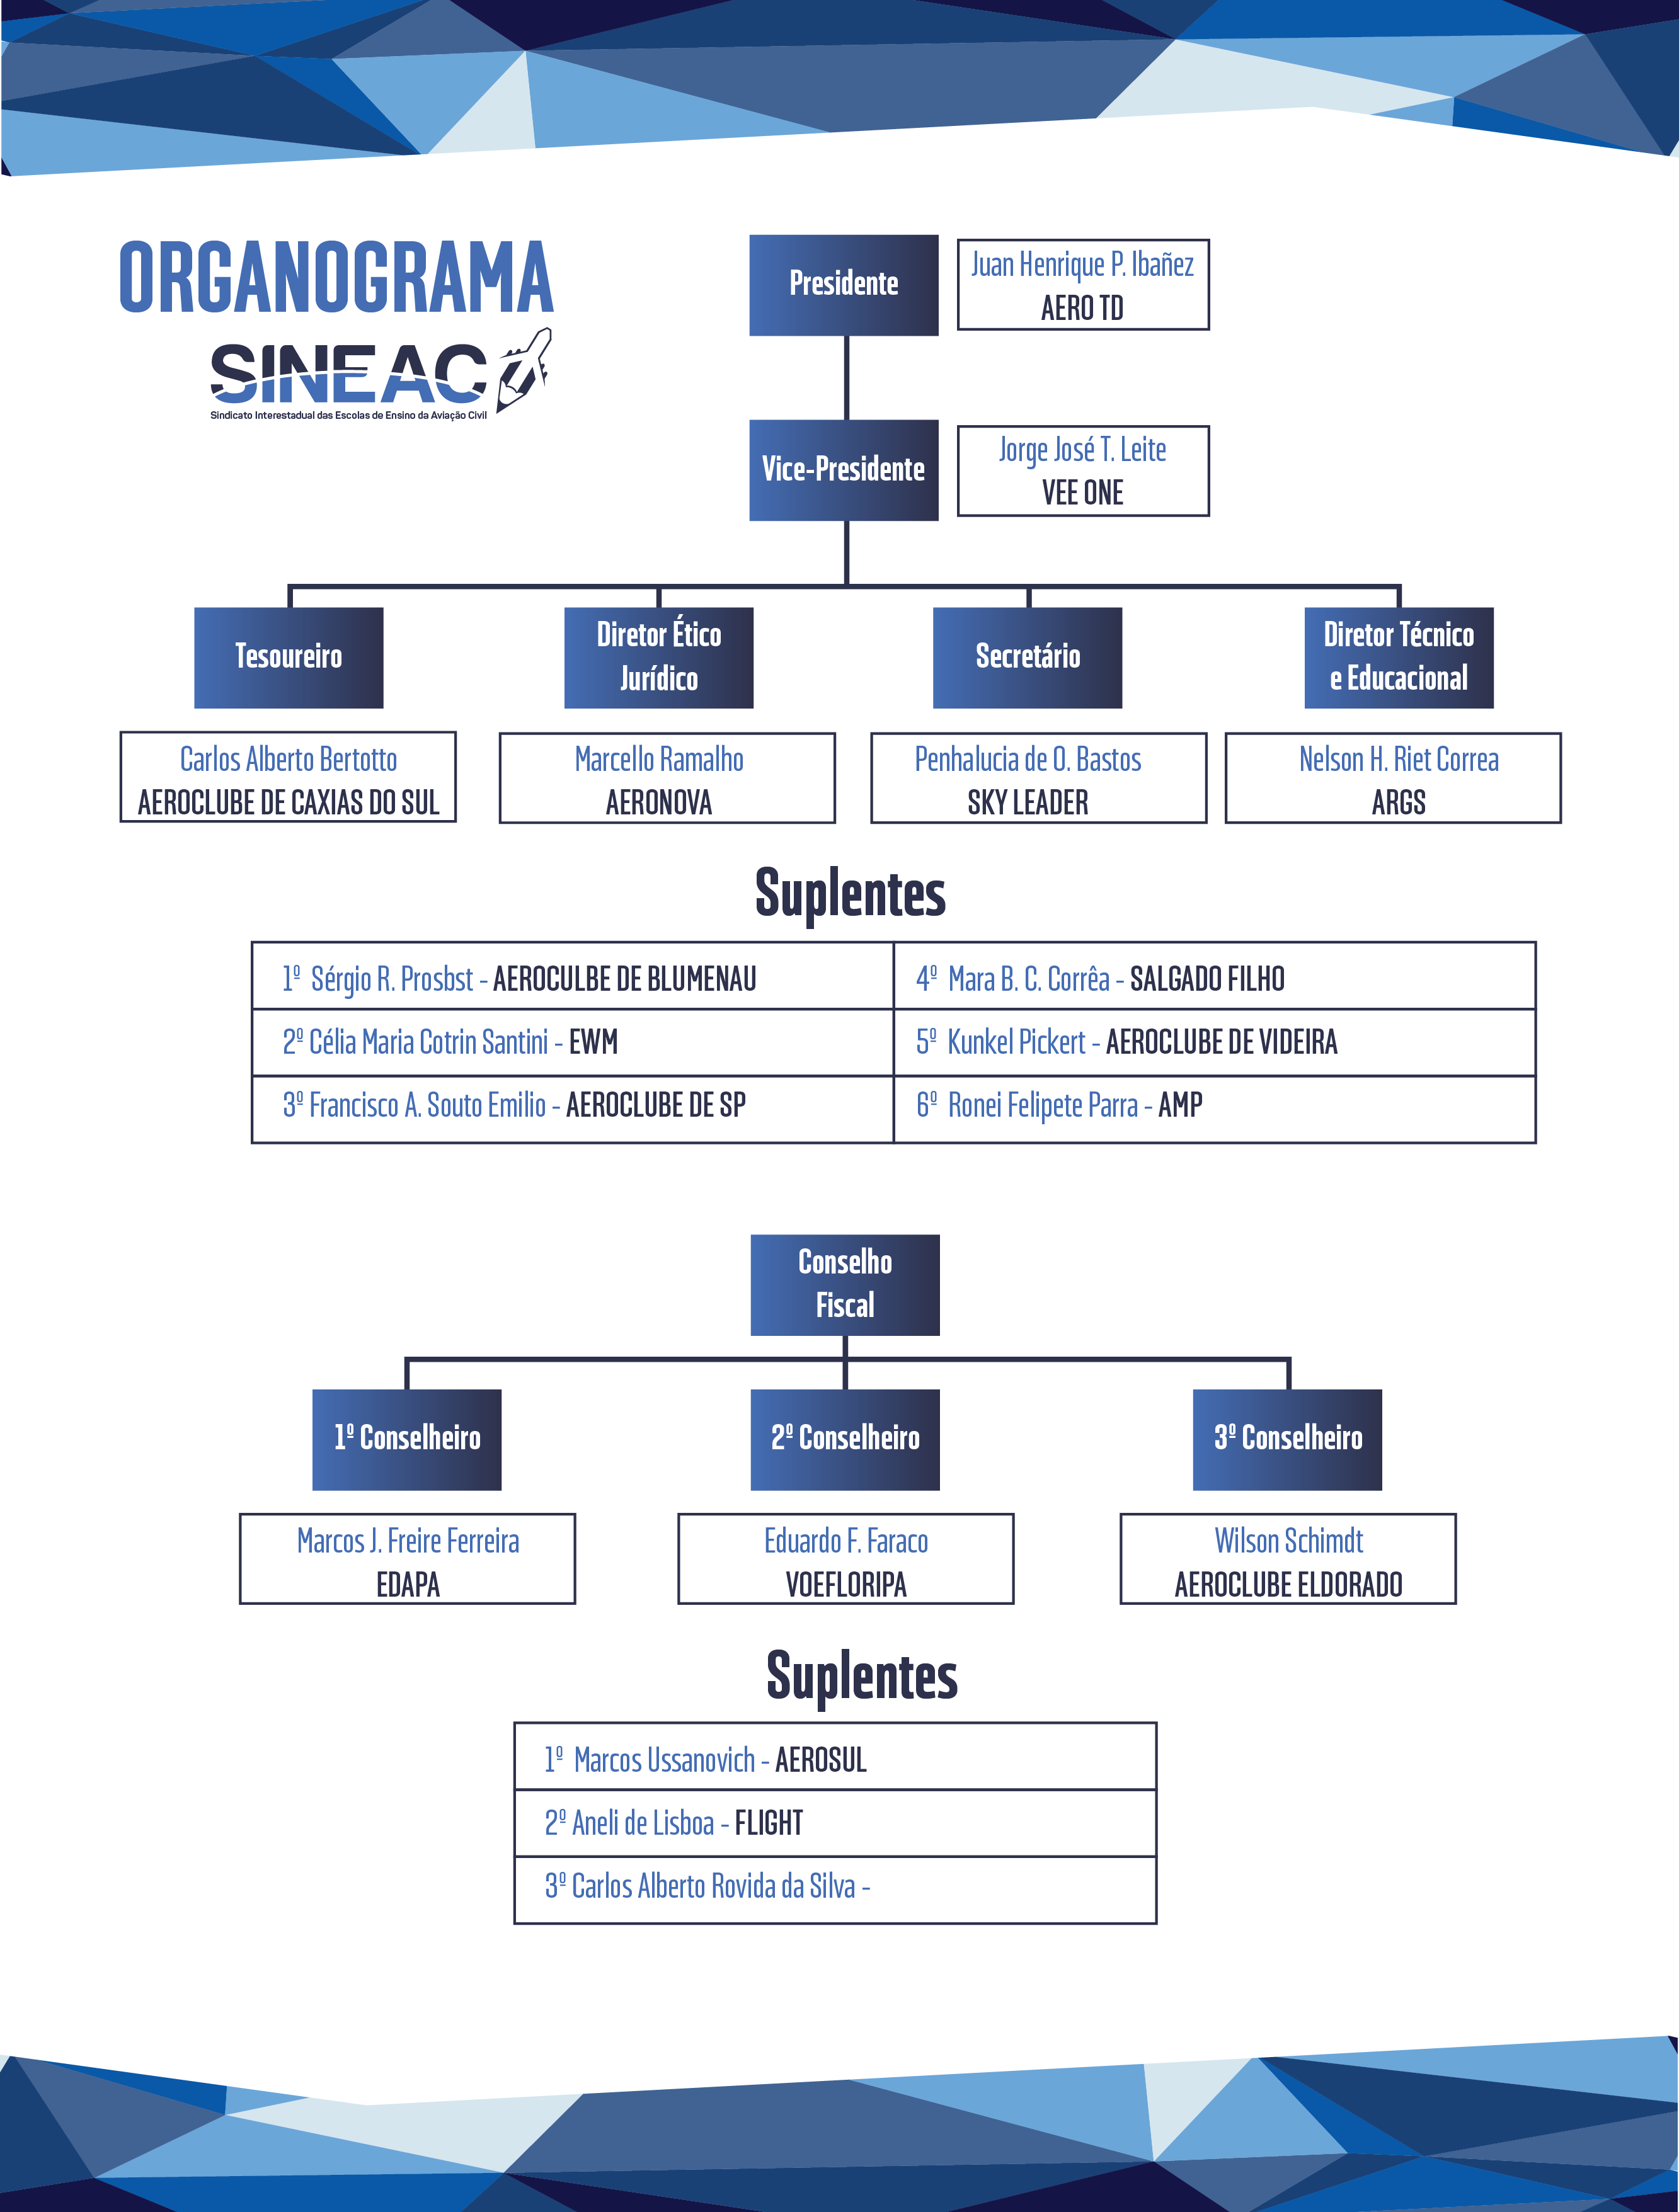 ORGANOGRAMA SINEAC 2016